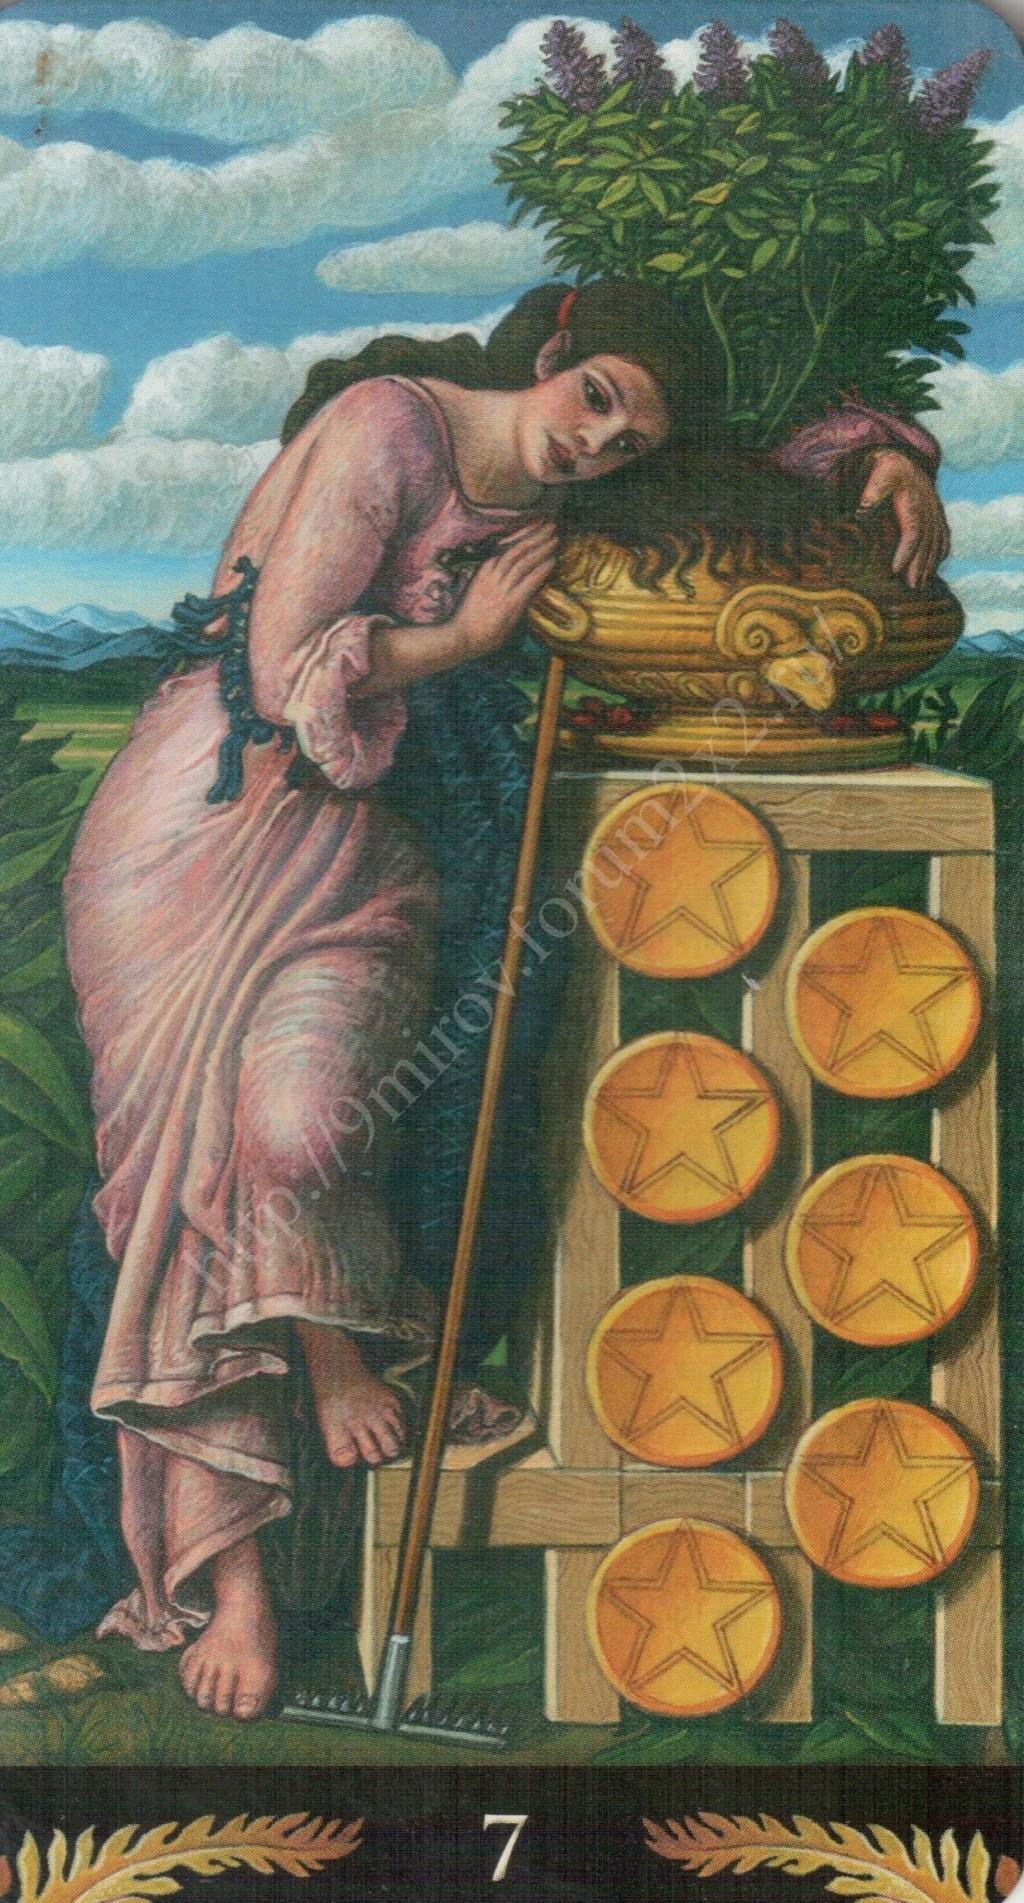 Таро Прерафаэлитов (Pre-Raphaelite Tarot) Галерея Water408